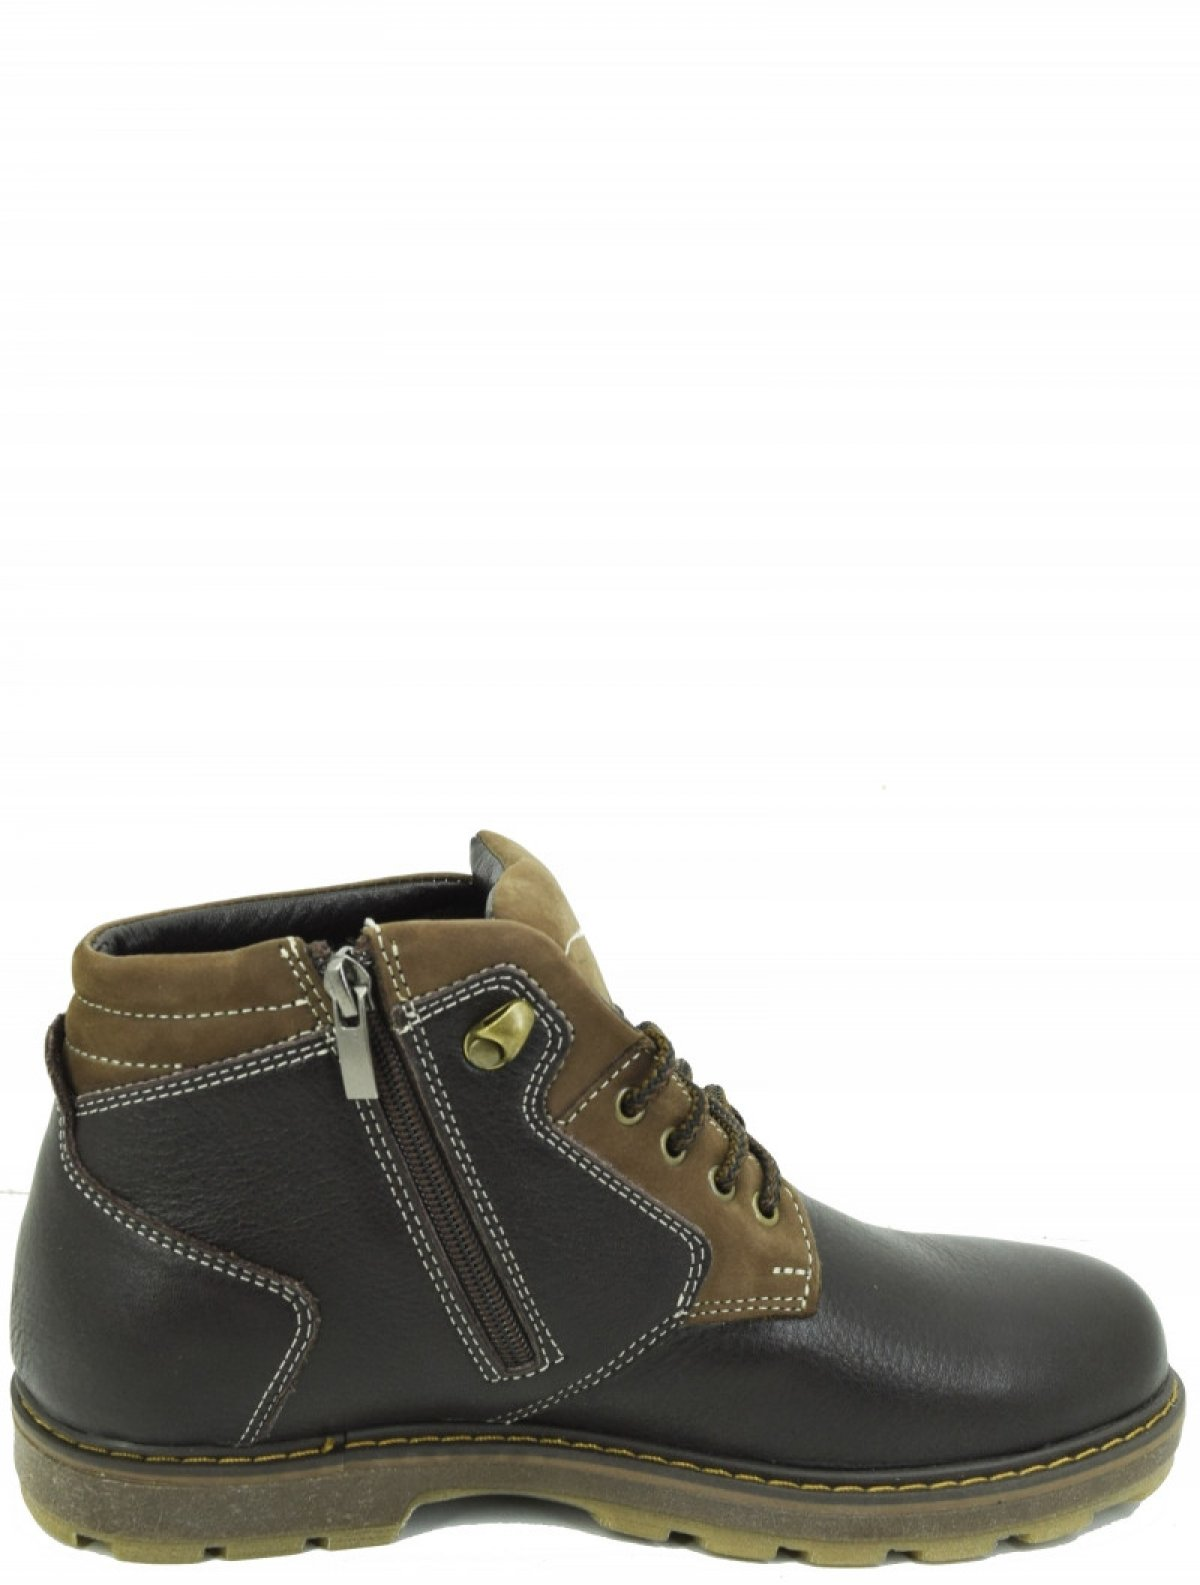 Baratto 1-854-302-2 мужские ботинки